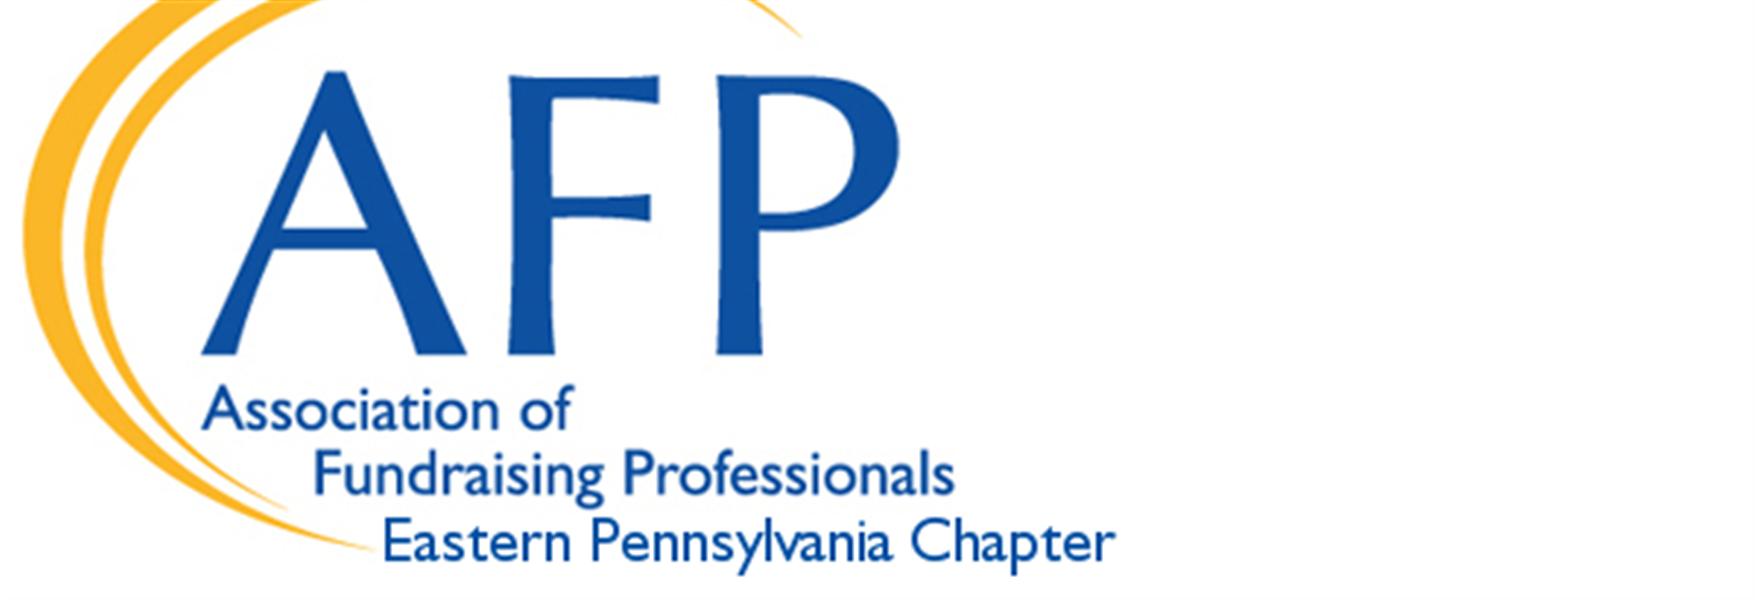 f114ca6a-1c6d-46a6-94dc-dec415d53446_AFP - EPA Logo.php.png